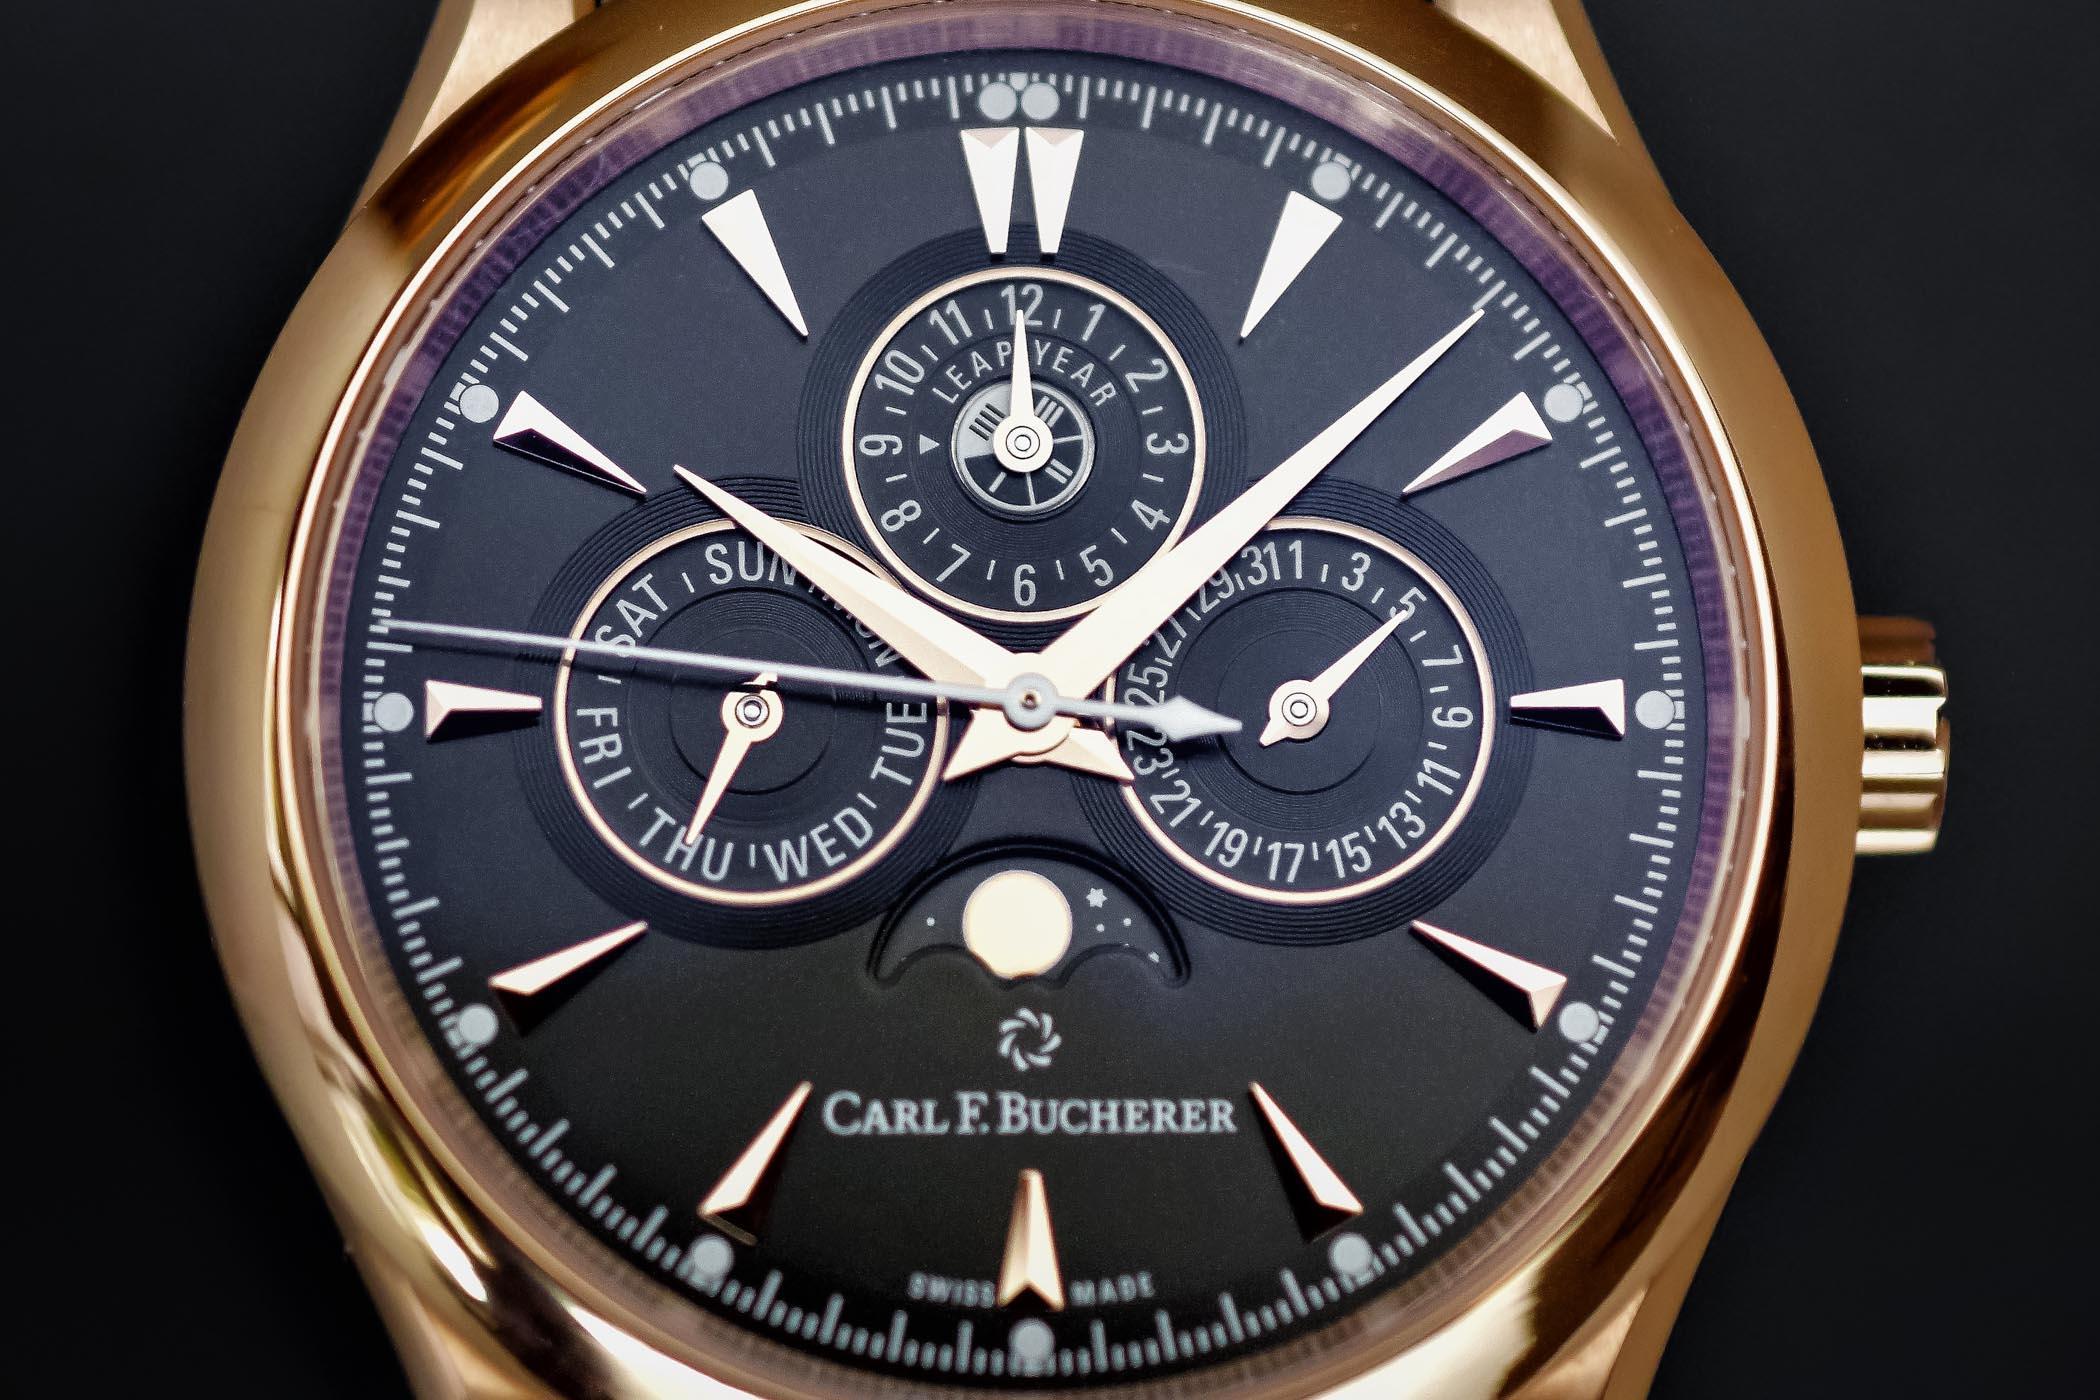 Carl F. Bucherer Manero Perpetual Limited Edition